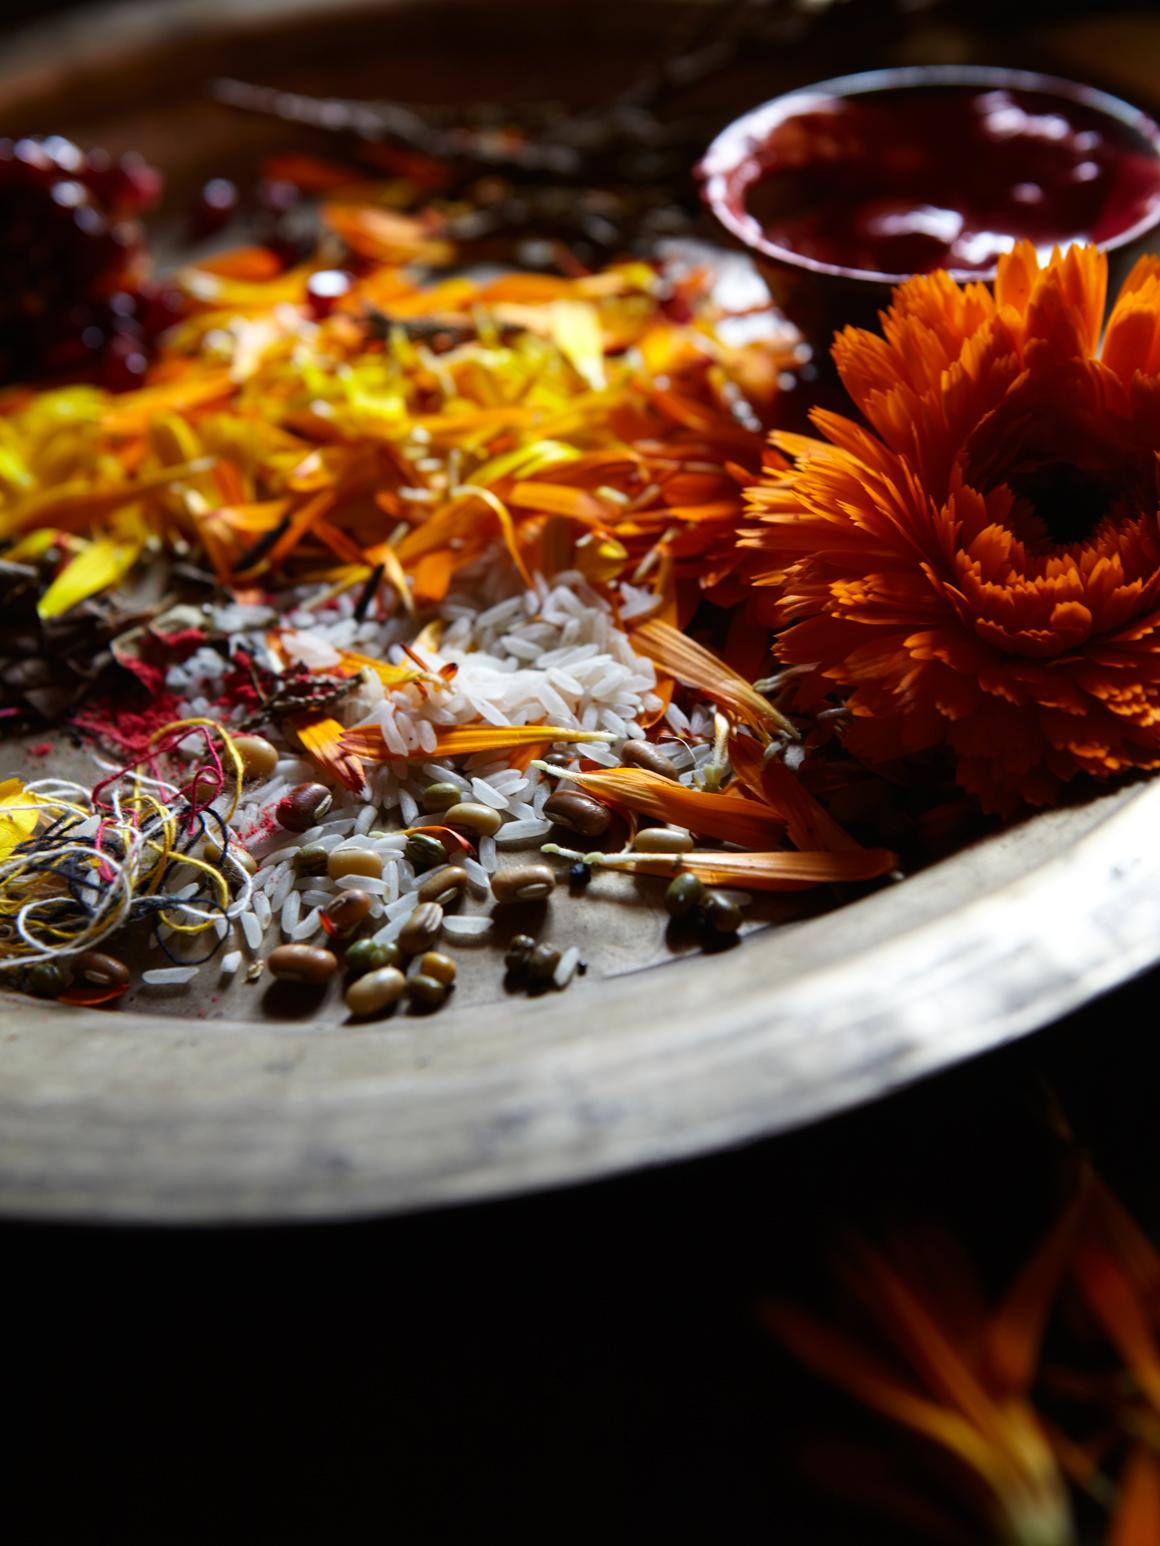 130204_CNT_Ganesh_Offering_Plate_2907.jpg